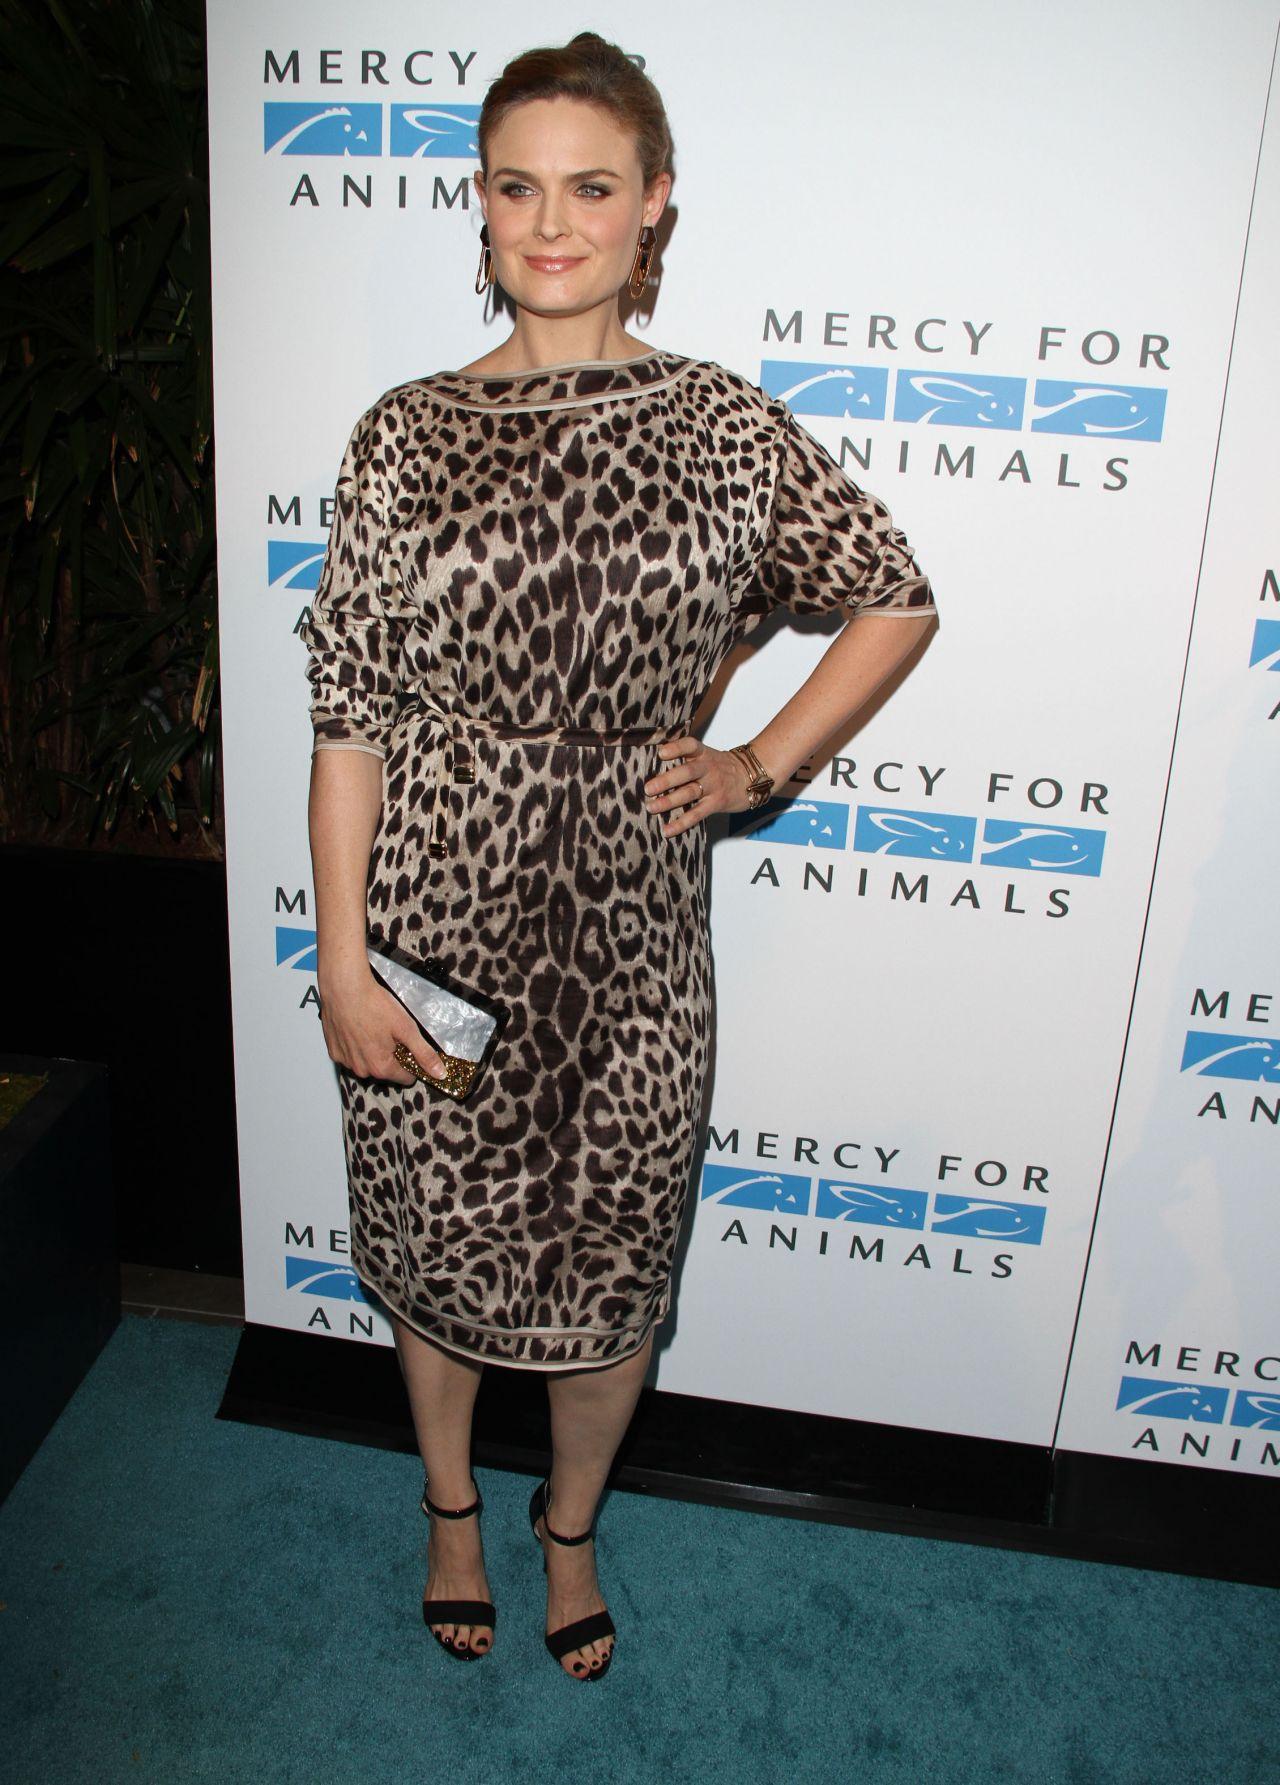 Hotel emily hotel r - Emily Deschanel 2014 Mercy For Animals Gala In London Hotel California